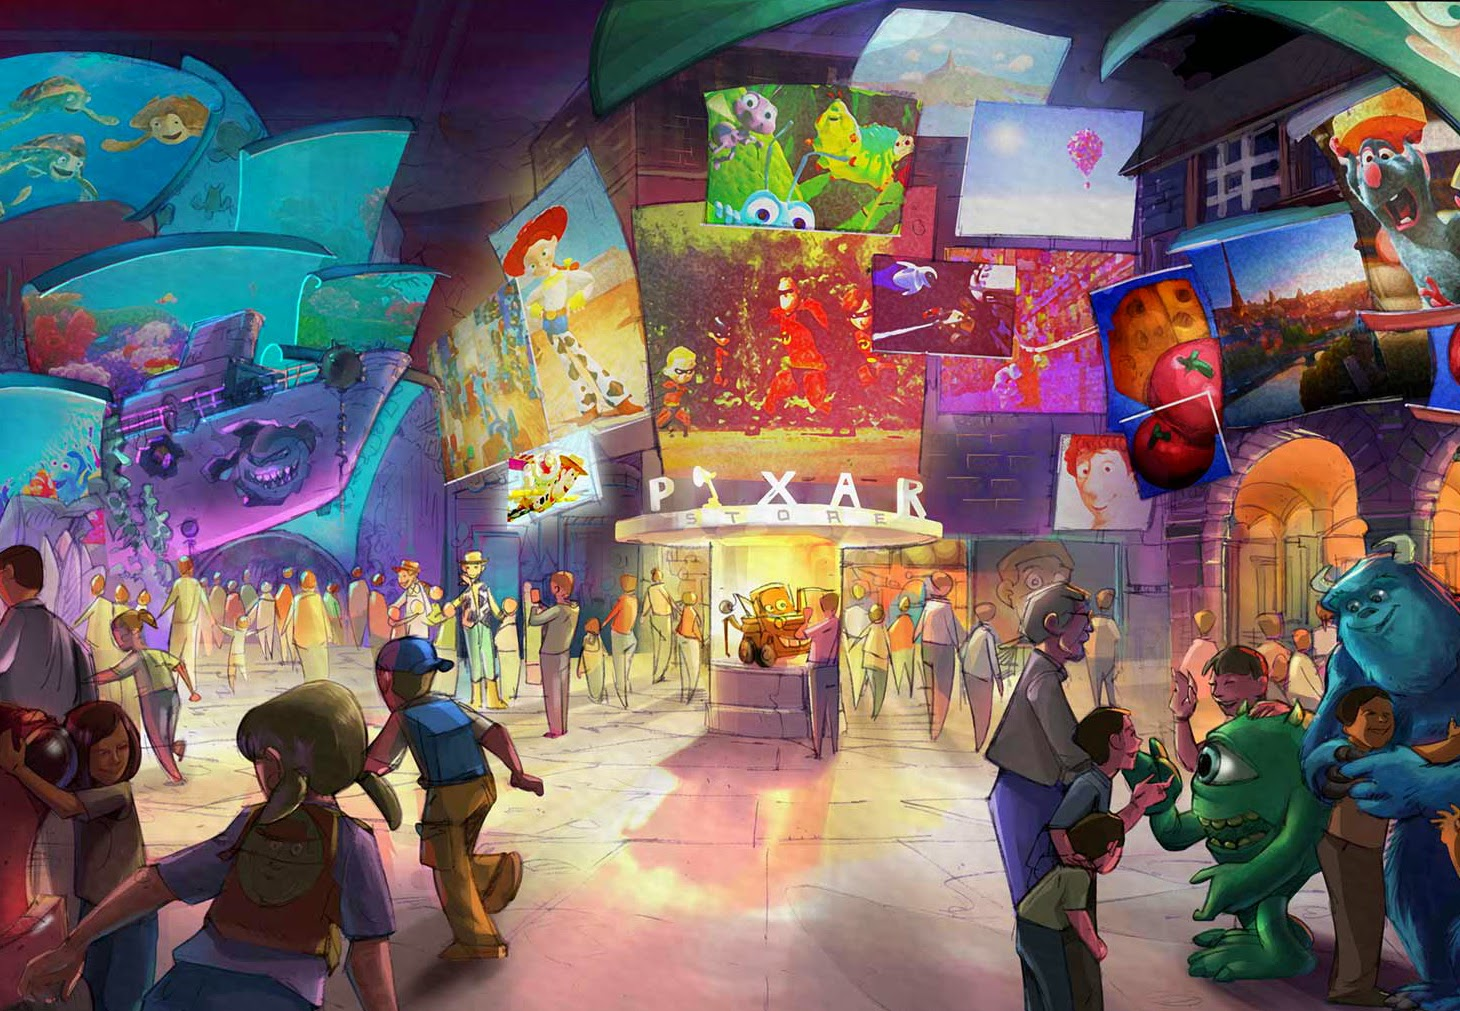 Dubai Disneyland - Pixar Store